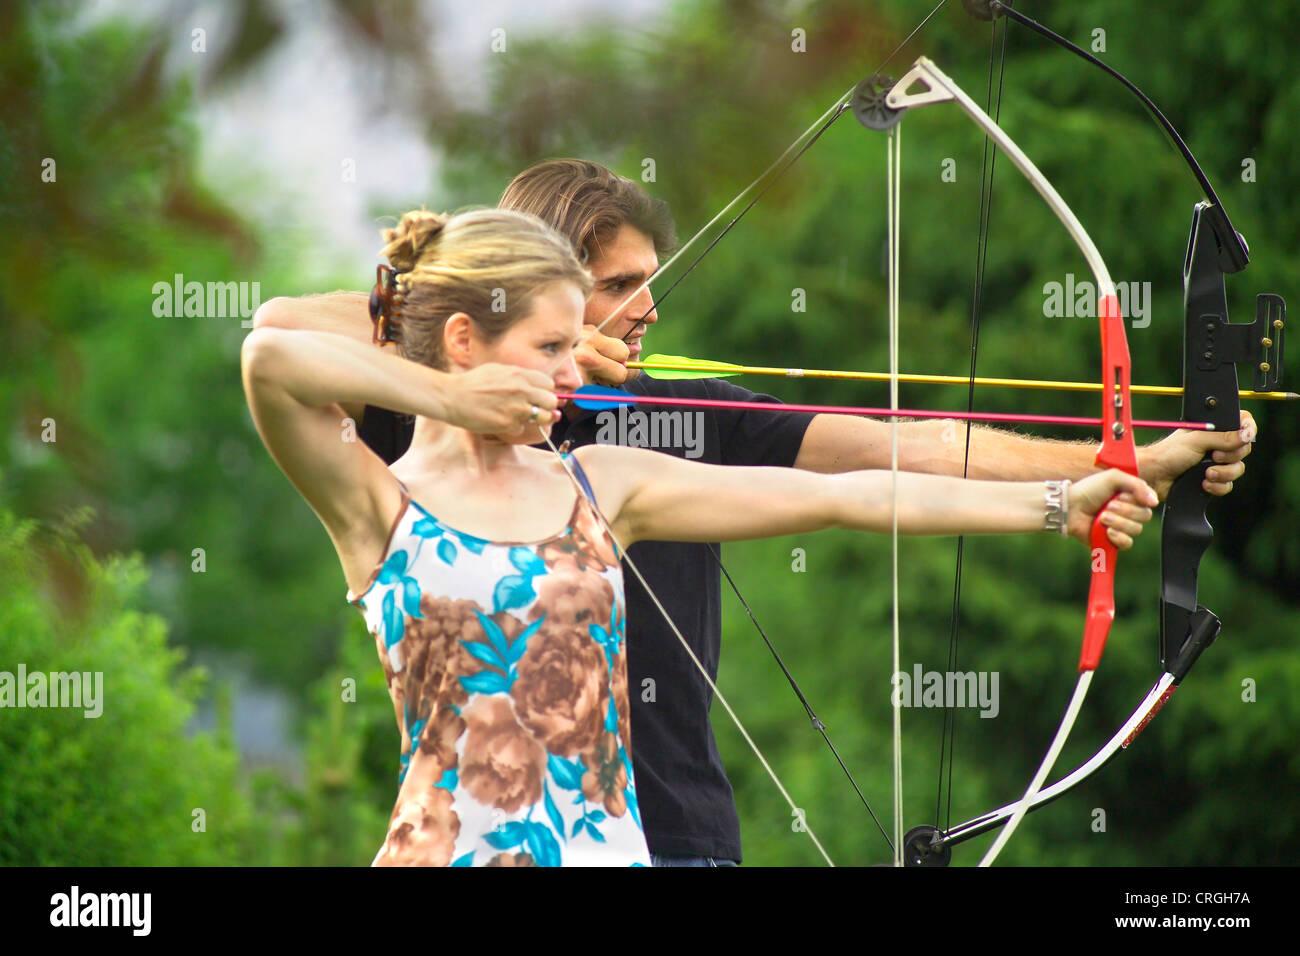 Archering